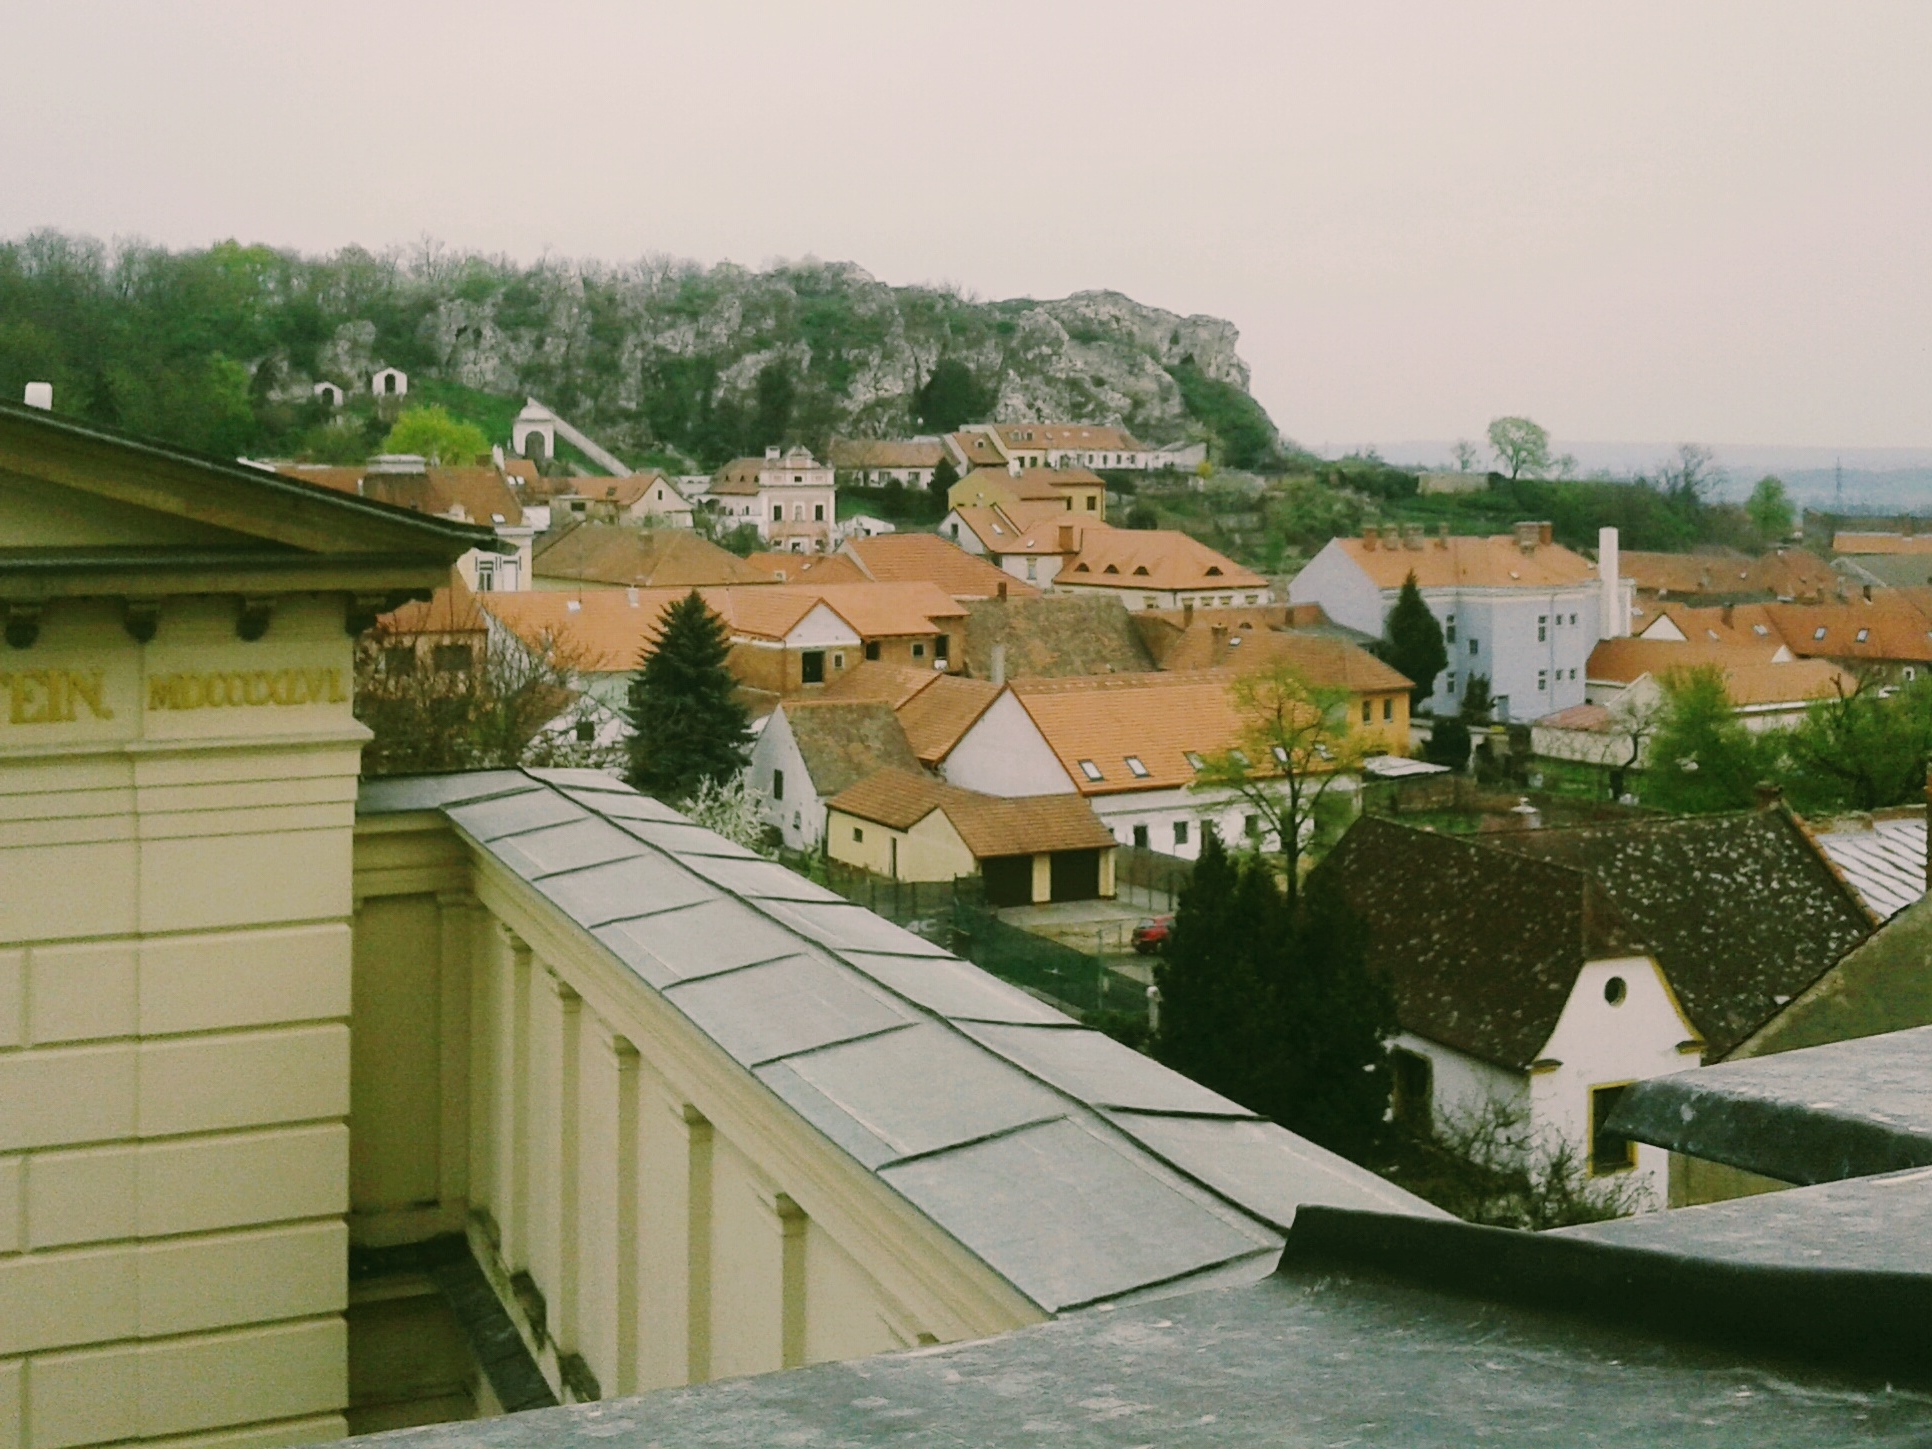 https://i.amy.gy/201804-slovakia-austria-czech/IMG_20180416_162022.jpg